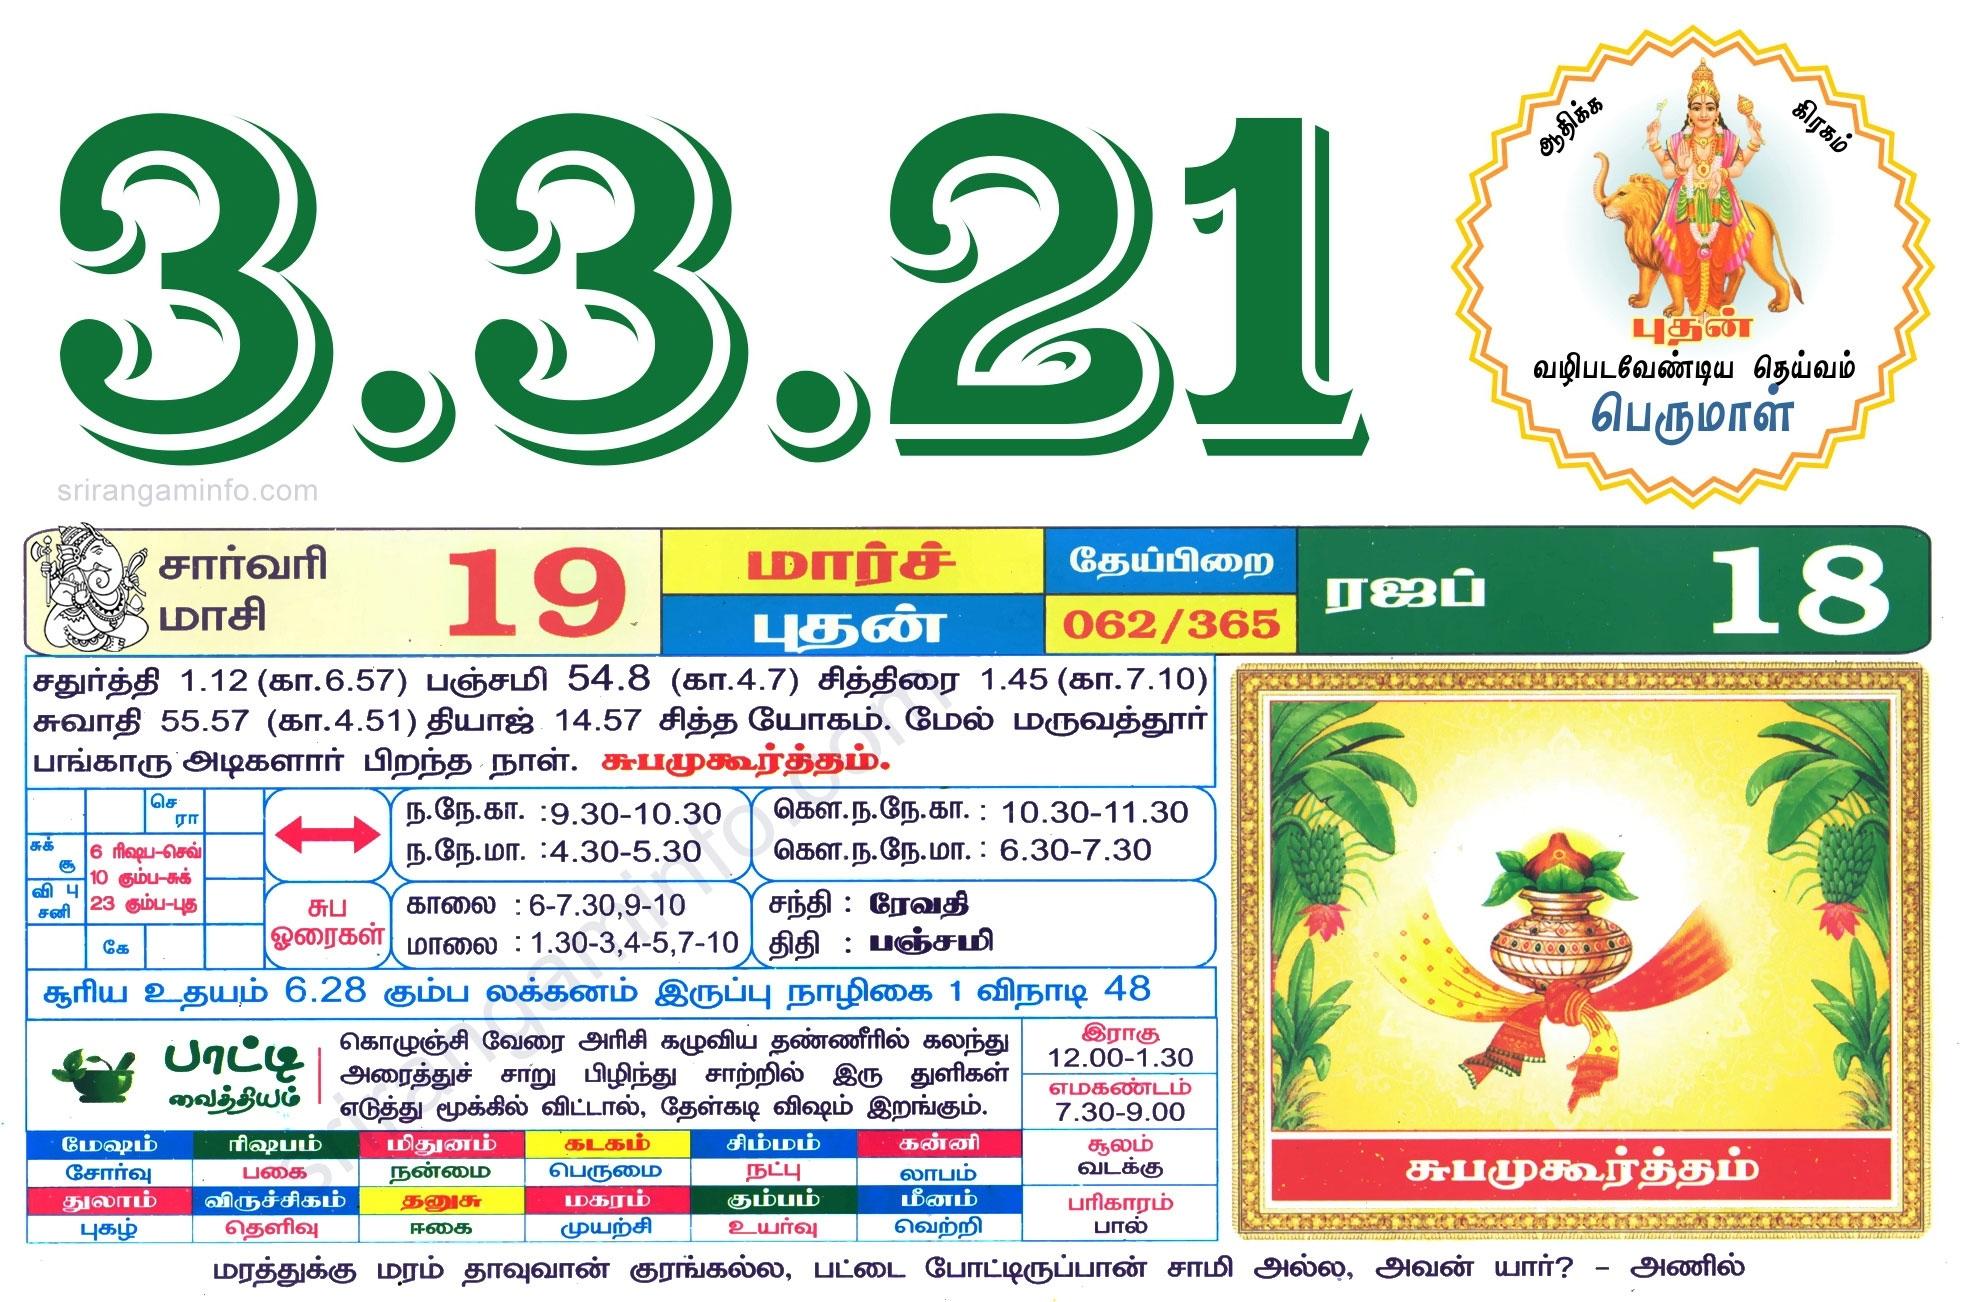 Tamil Monthly Calendar 2021, Tamil Calendar 2021 To 2009 November 2021 Calendar Tamil